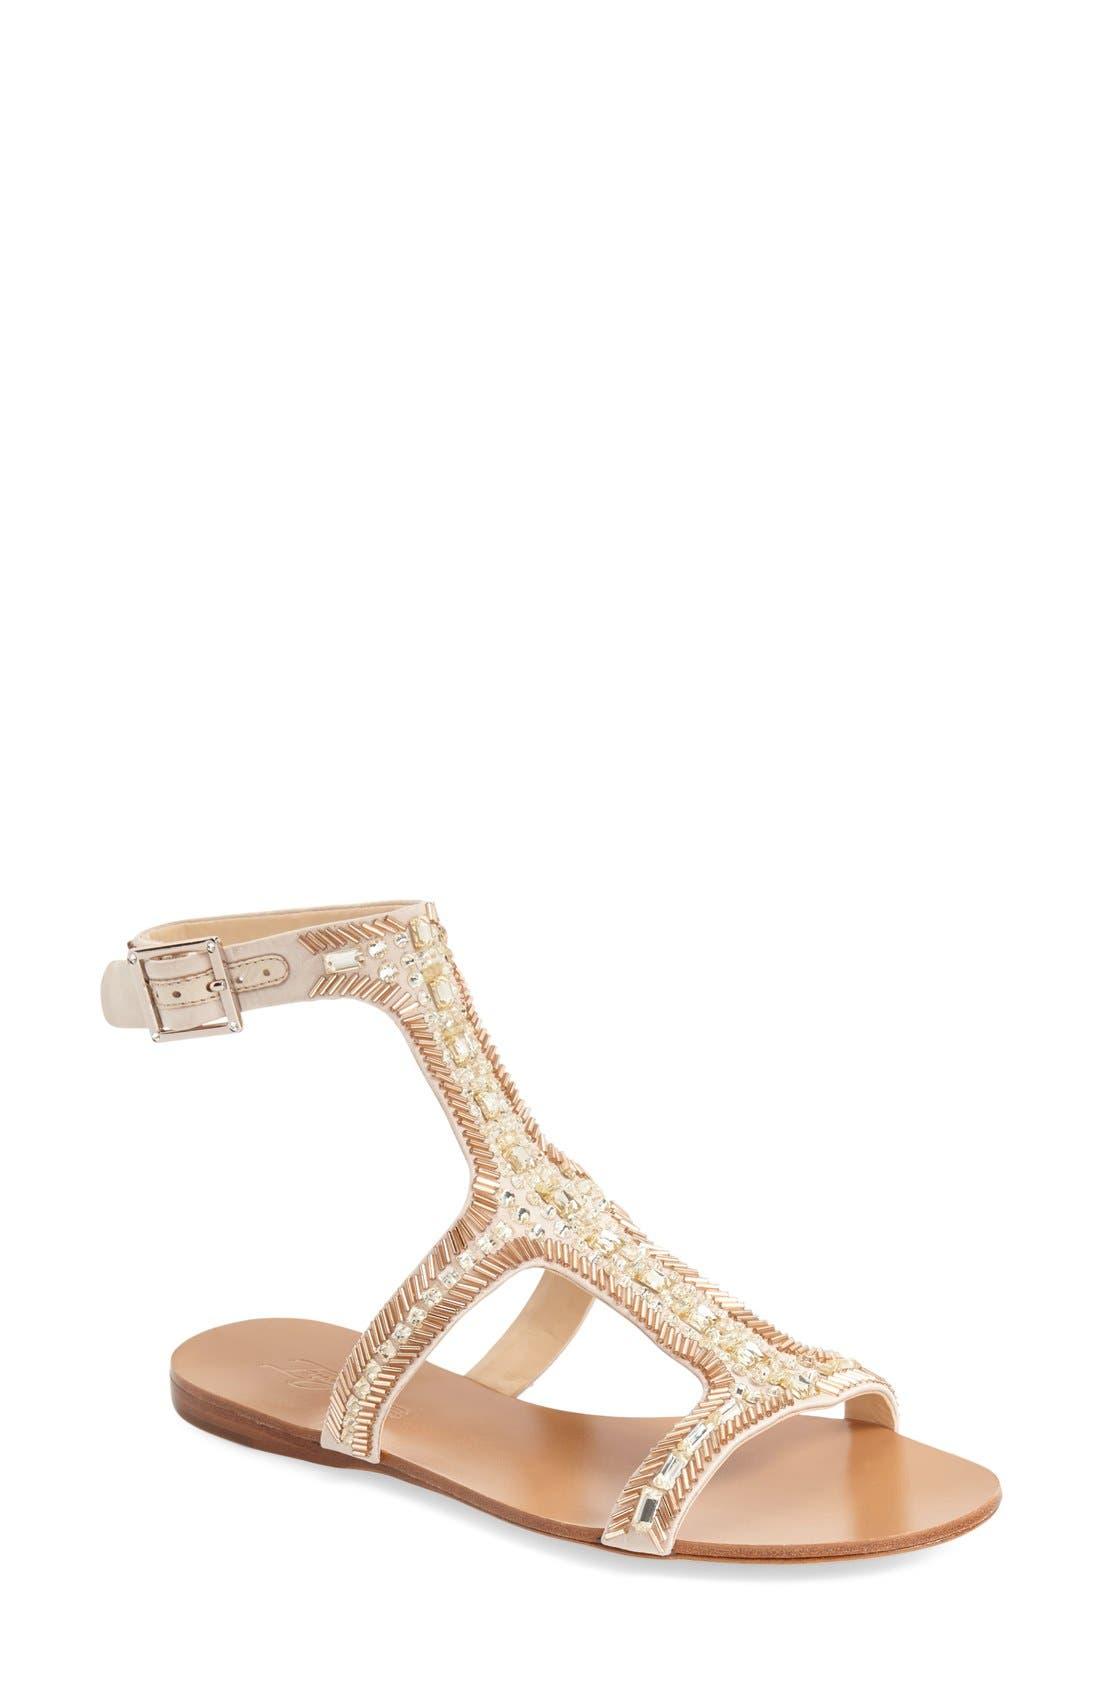 Imagine Vince Camuto 'Reid' Embellished T-Strap Flat Sandal,                             Main thumbnail 2, color,